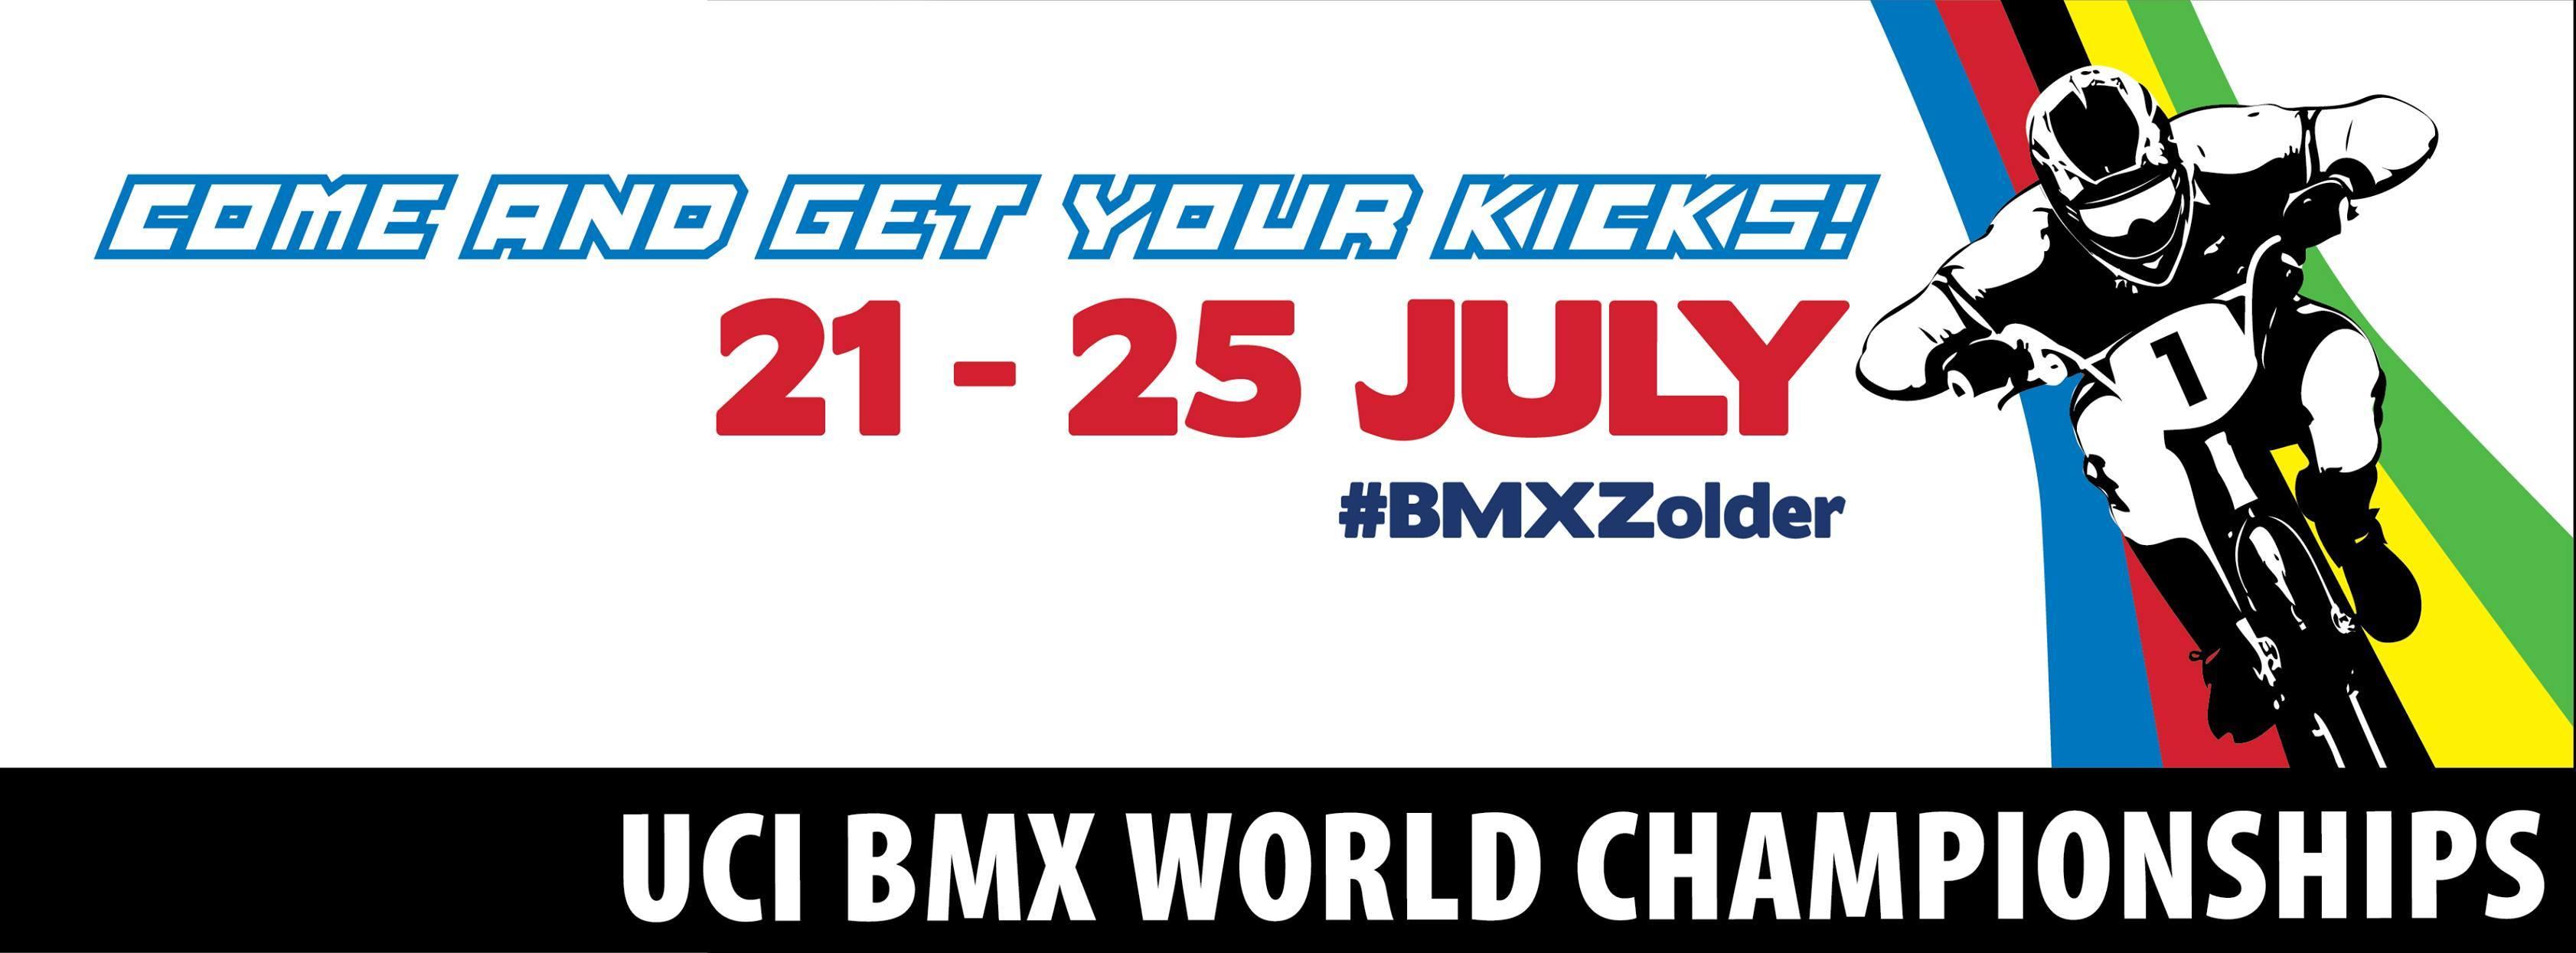 Selectiecriteria WK/World Challenge BMX 2015